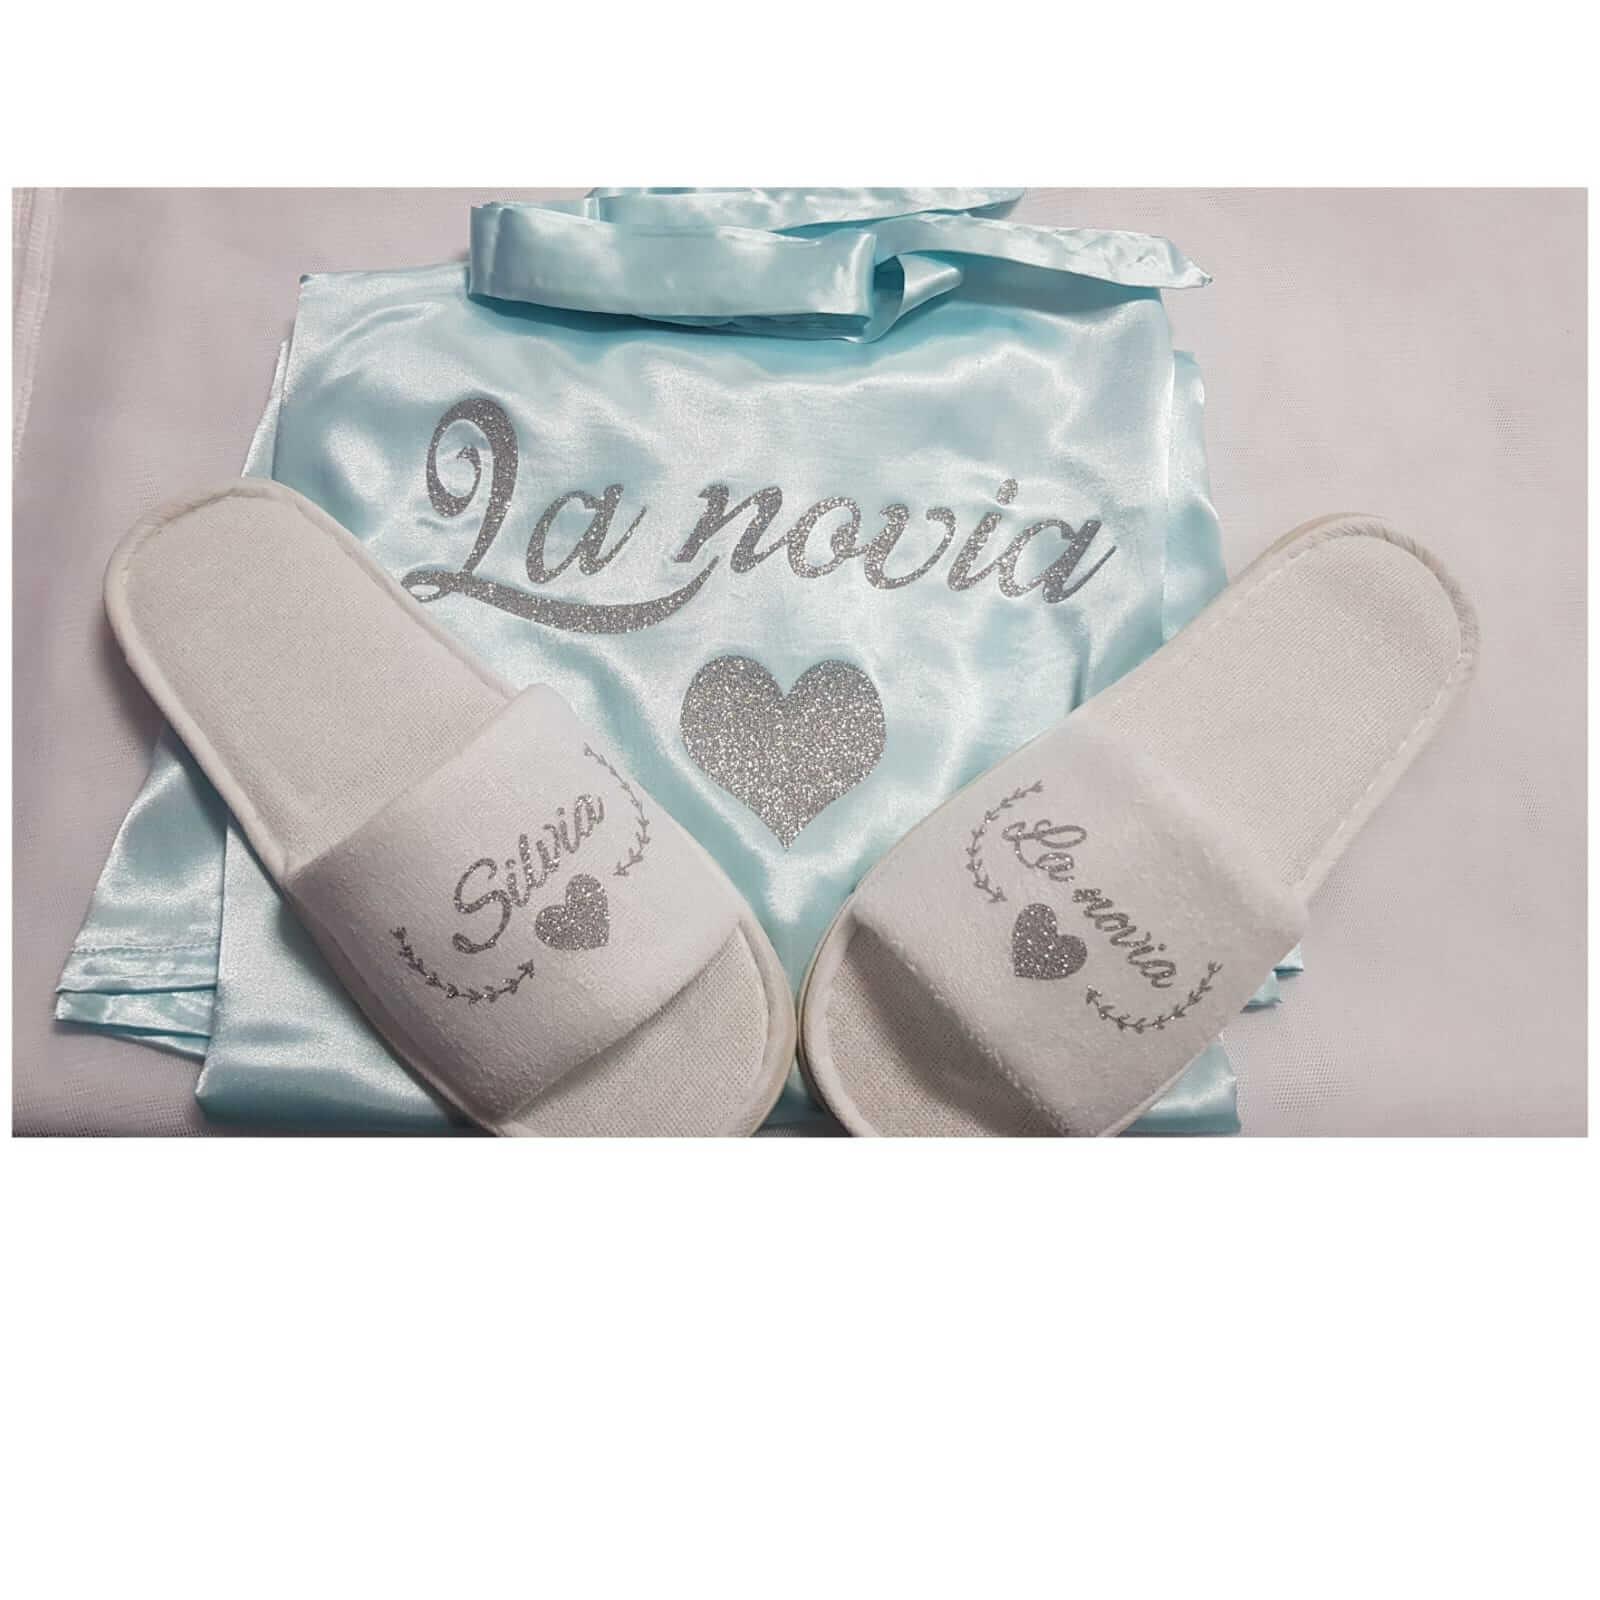 bata personalizada bata personalizada - Batas Personalizadas Batas Personalizadas novia 1 1 - Bata personalizada y Zapatillas personalizadas